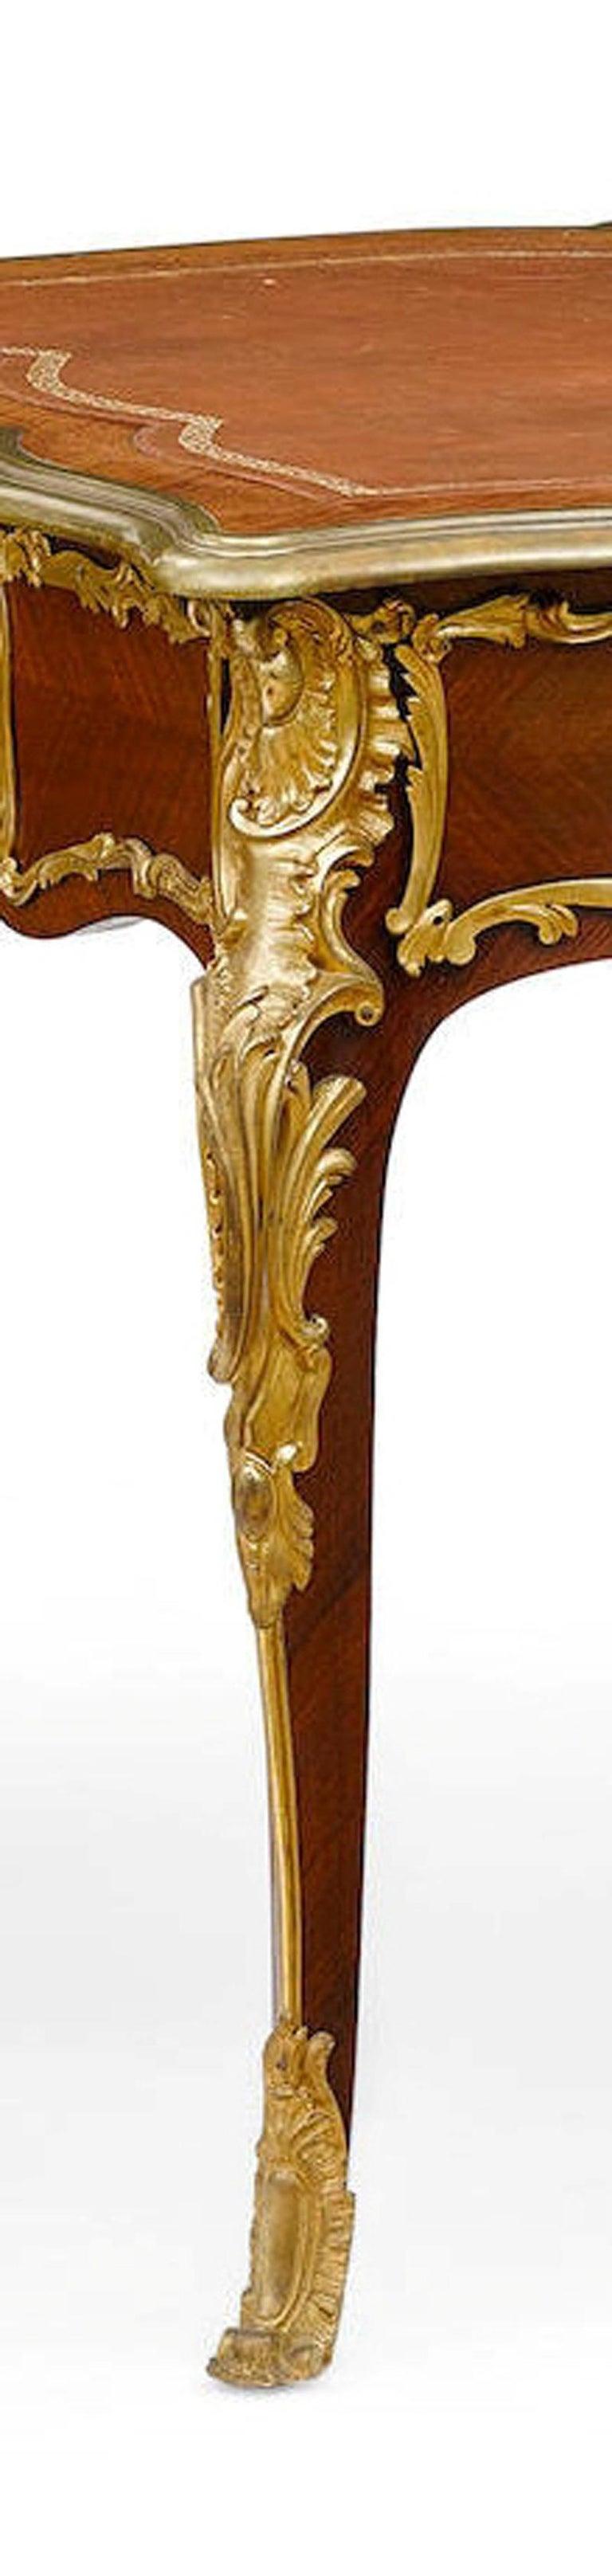 French Ormolu Mounted Bureau Plat Partner's Desk, 19th Century For Sale 4